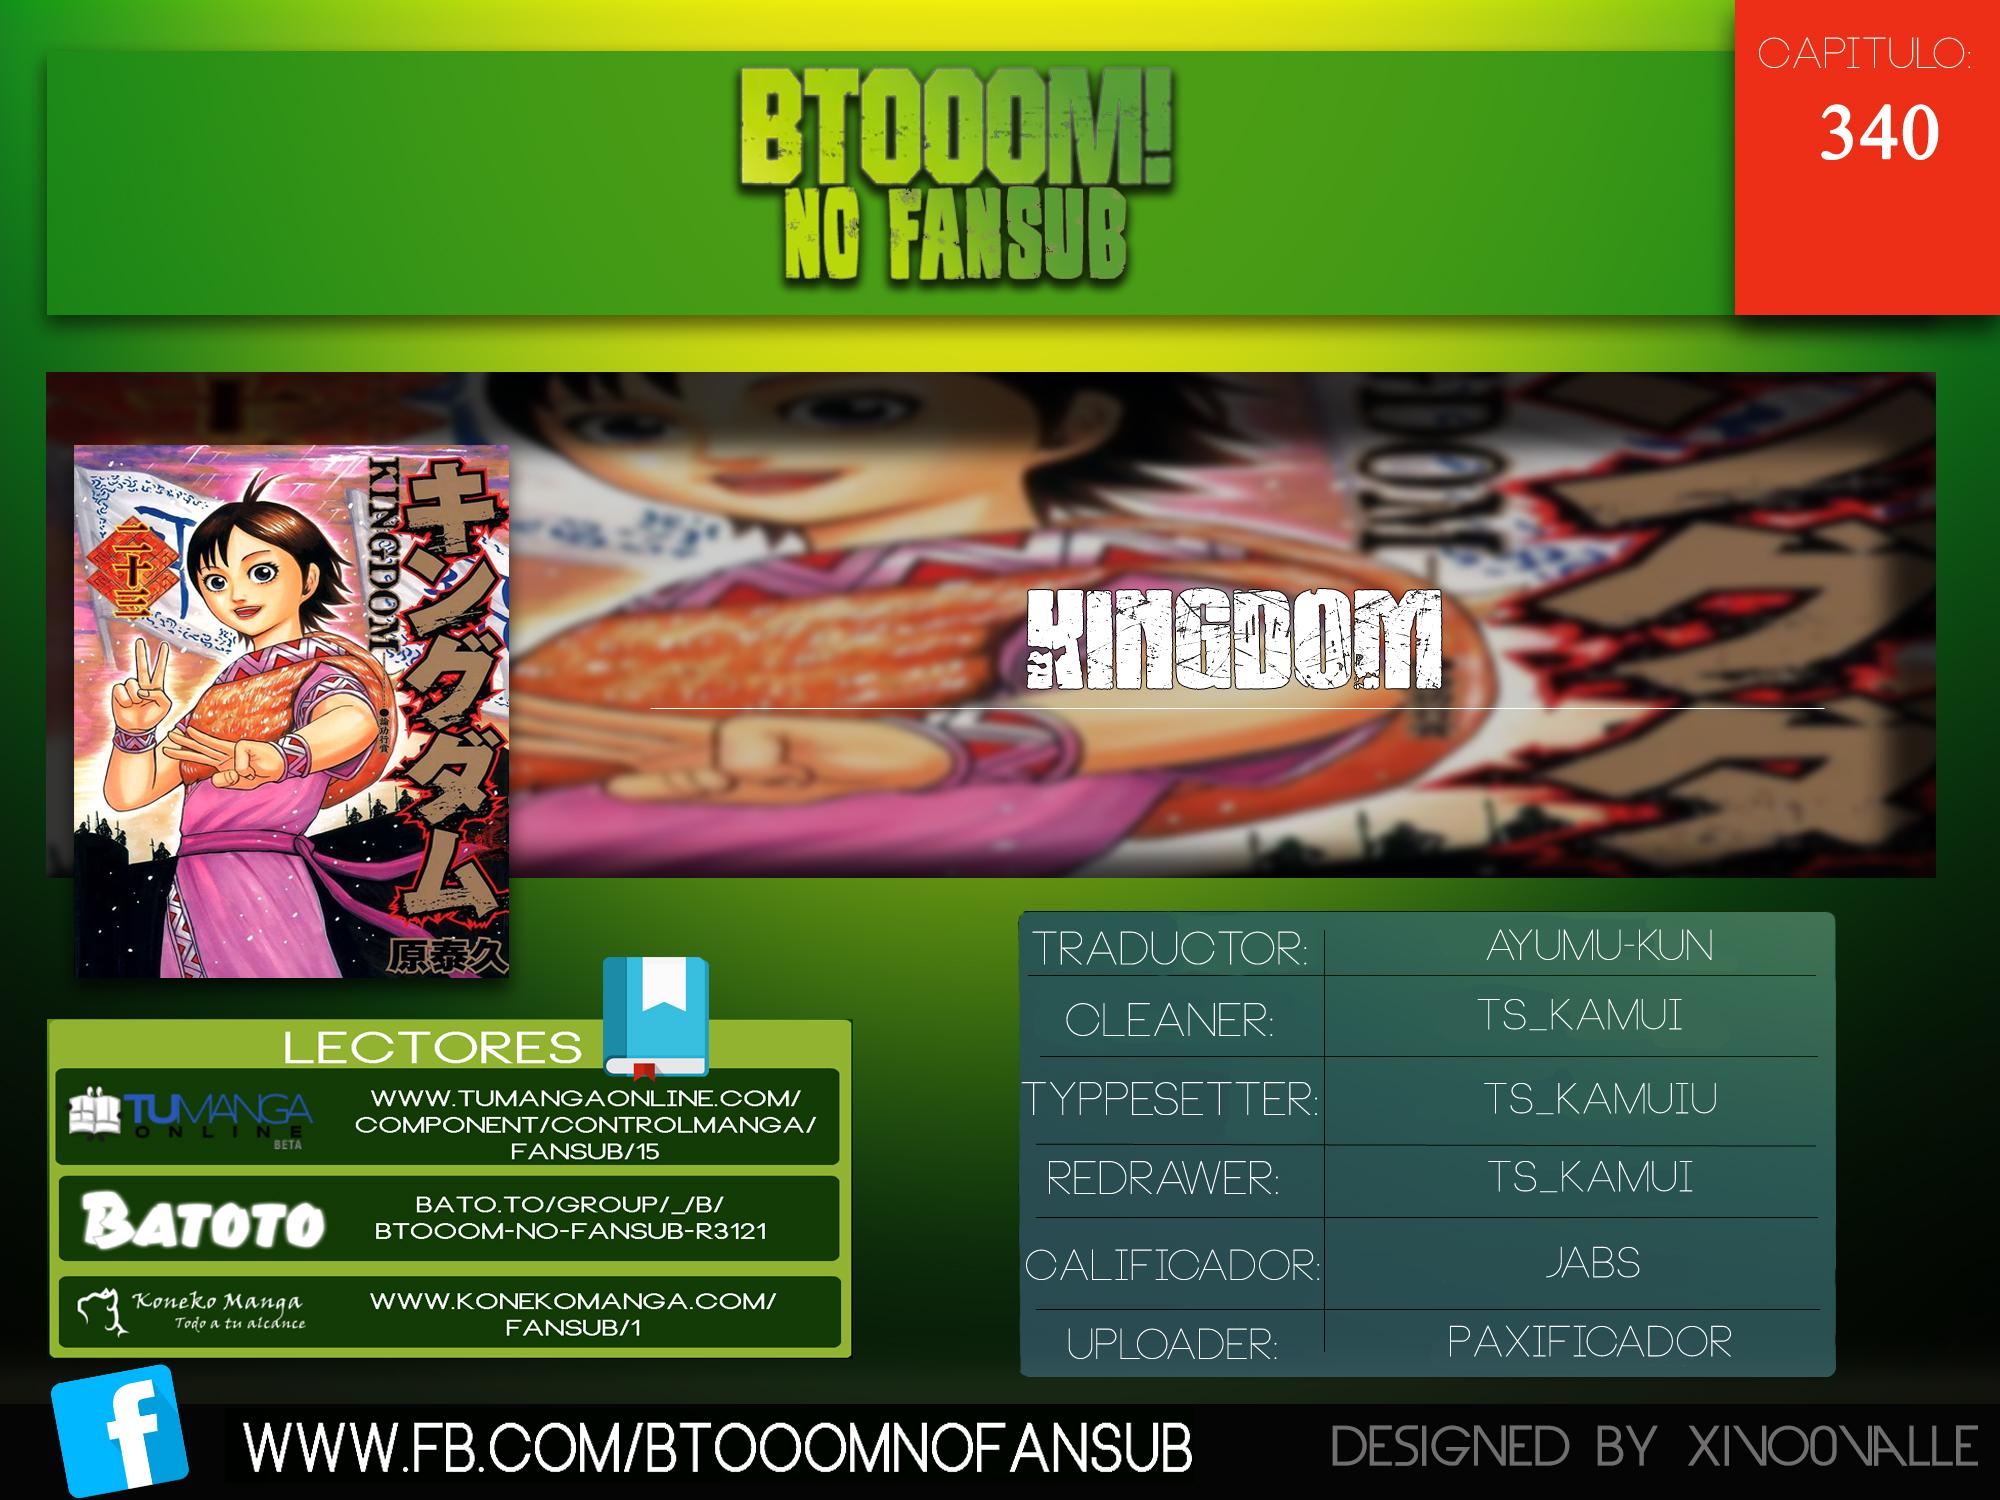 http://c5.ninemanga.com/es_manga/19/12307/360923/422f327894467d498cb7fc6f72be1517.jpg Page 1